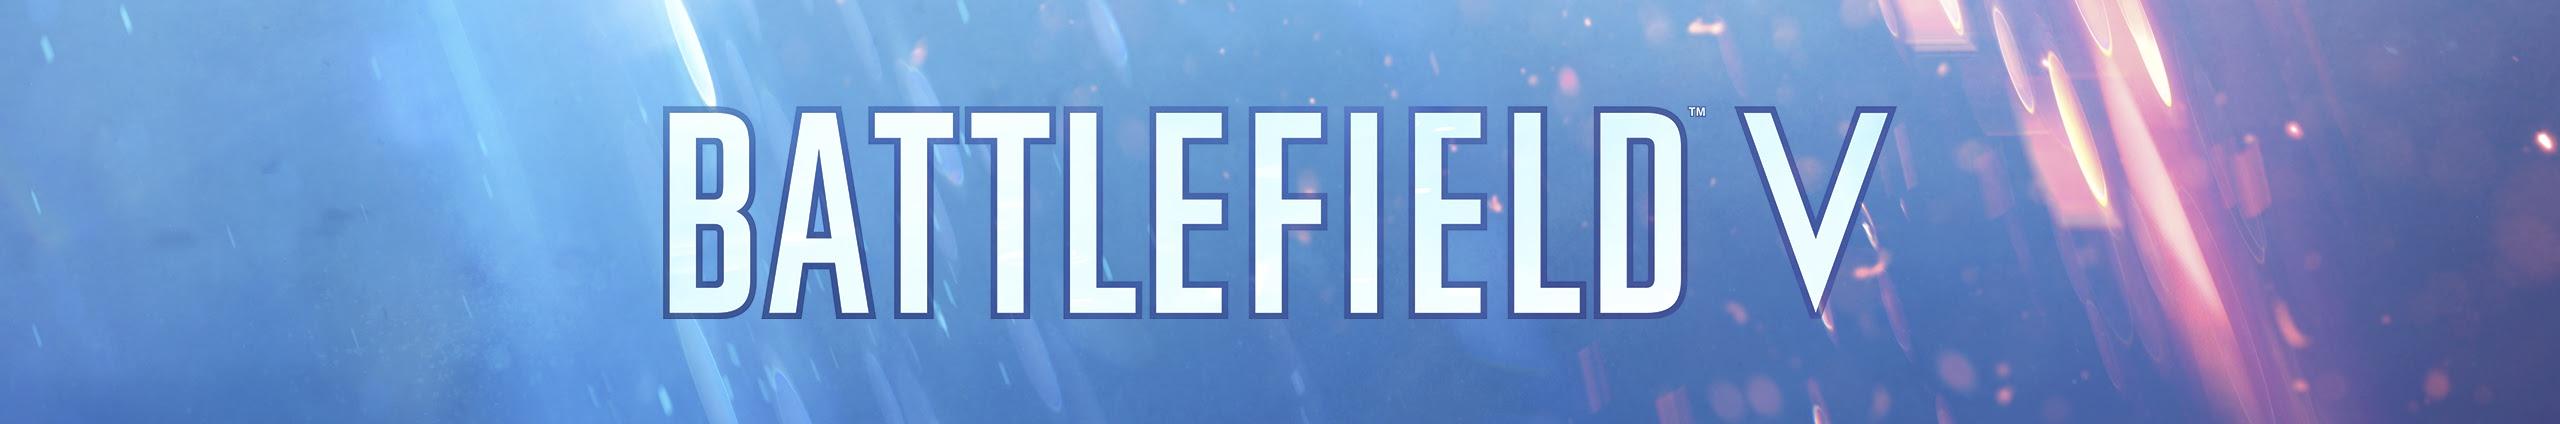 battlefield-v-banner